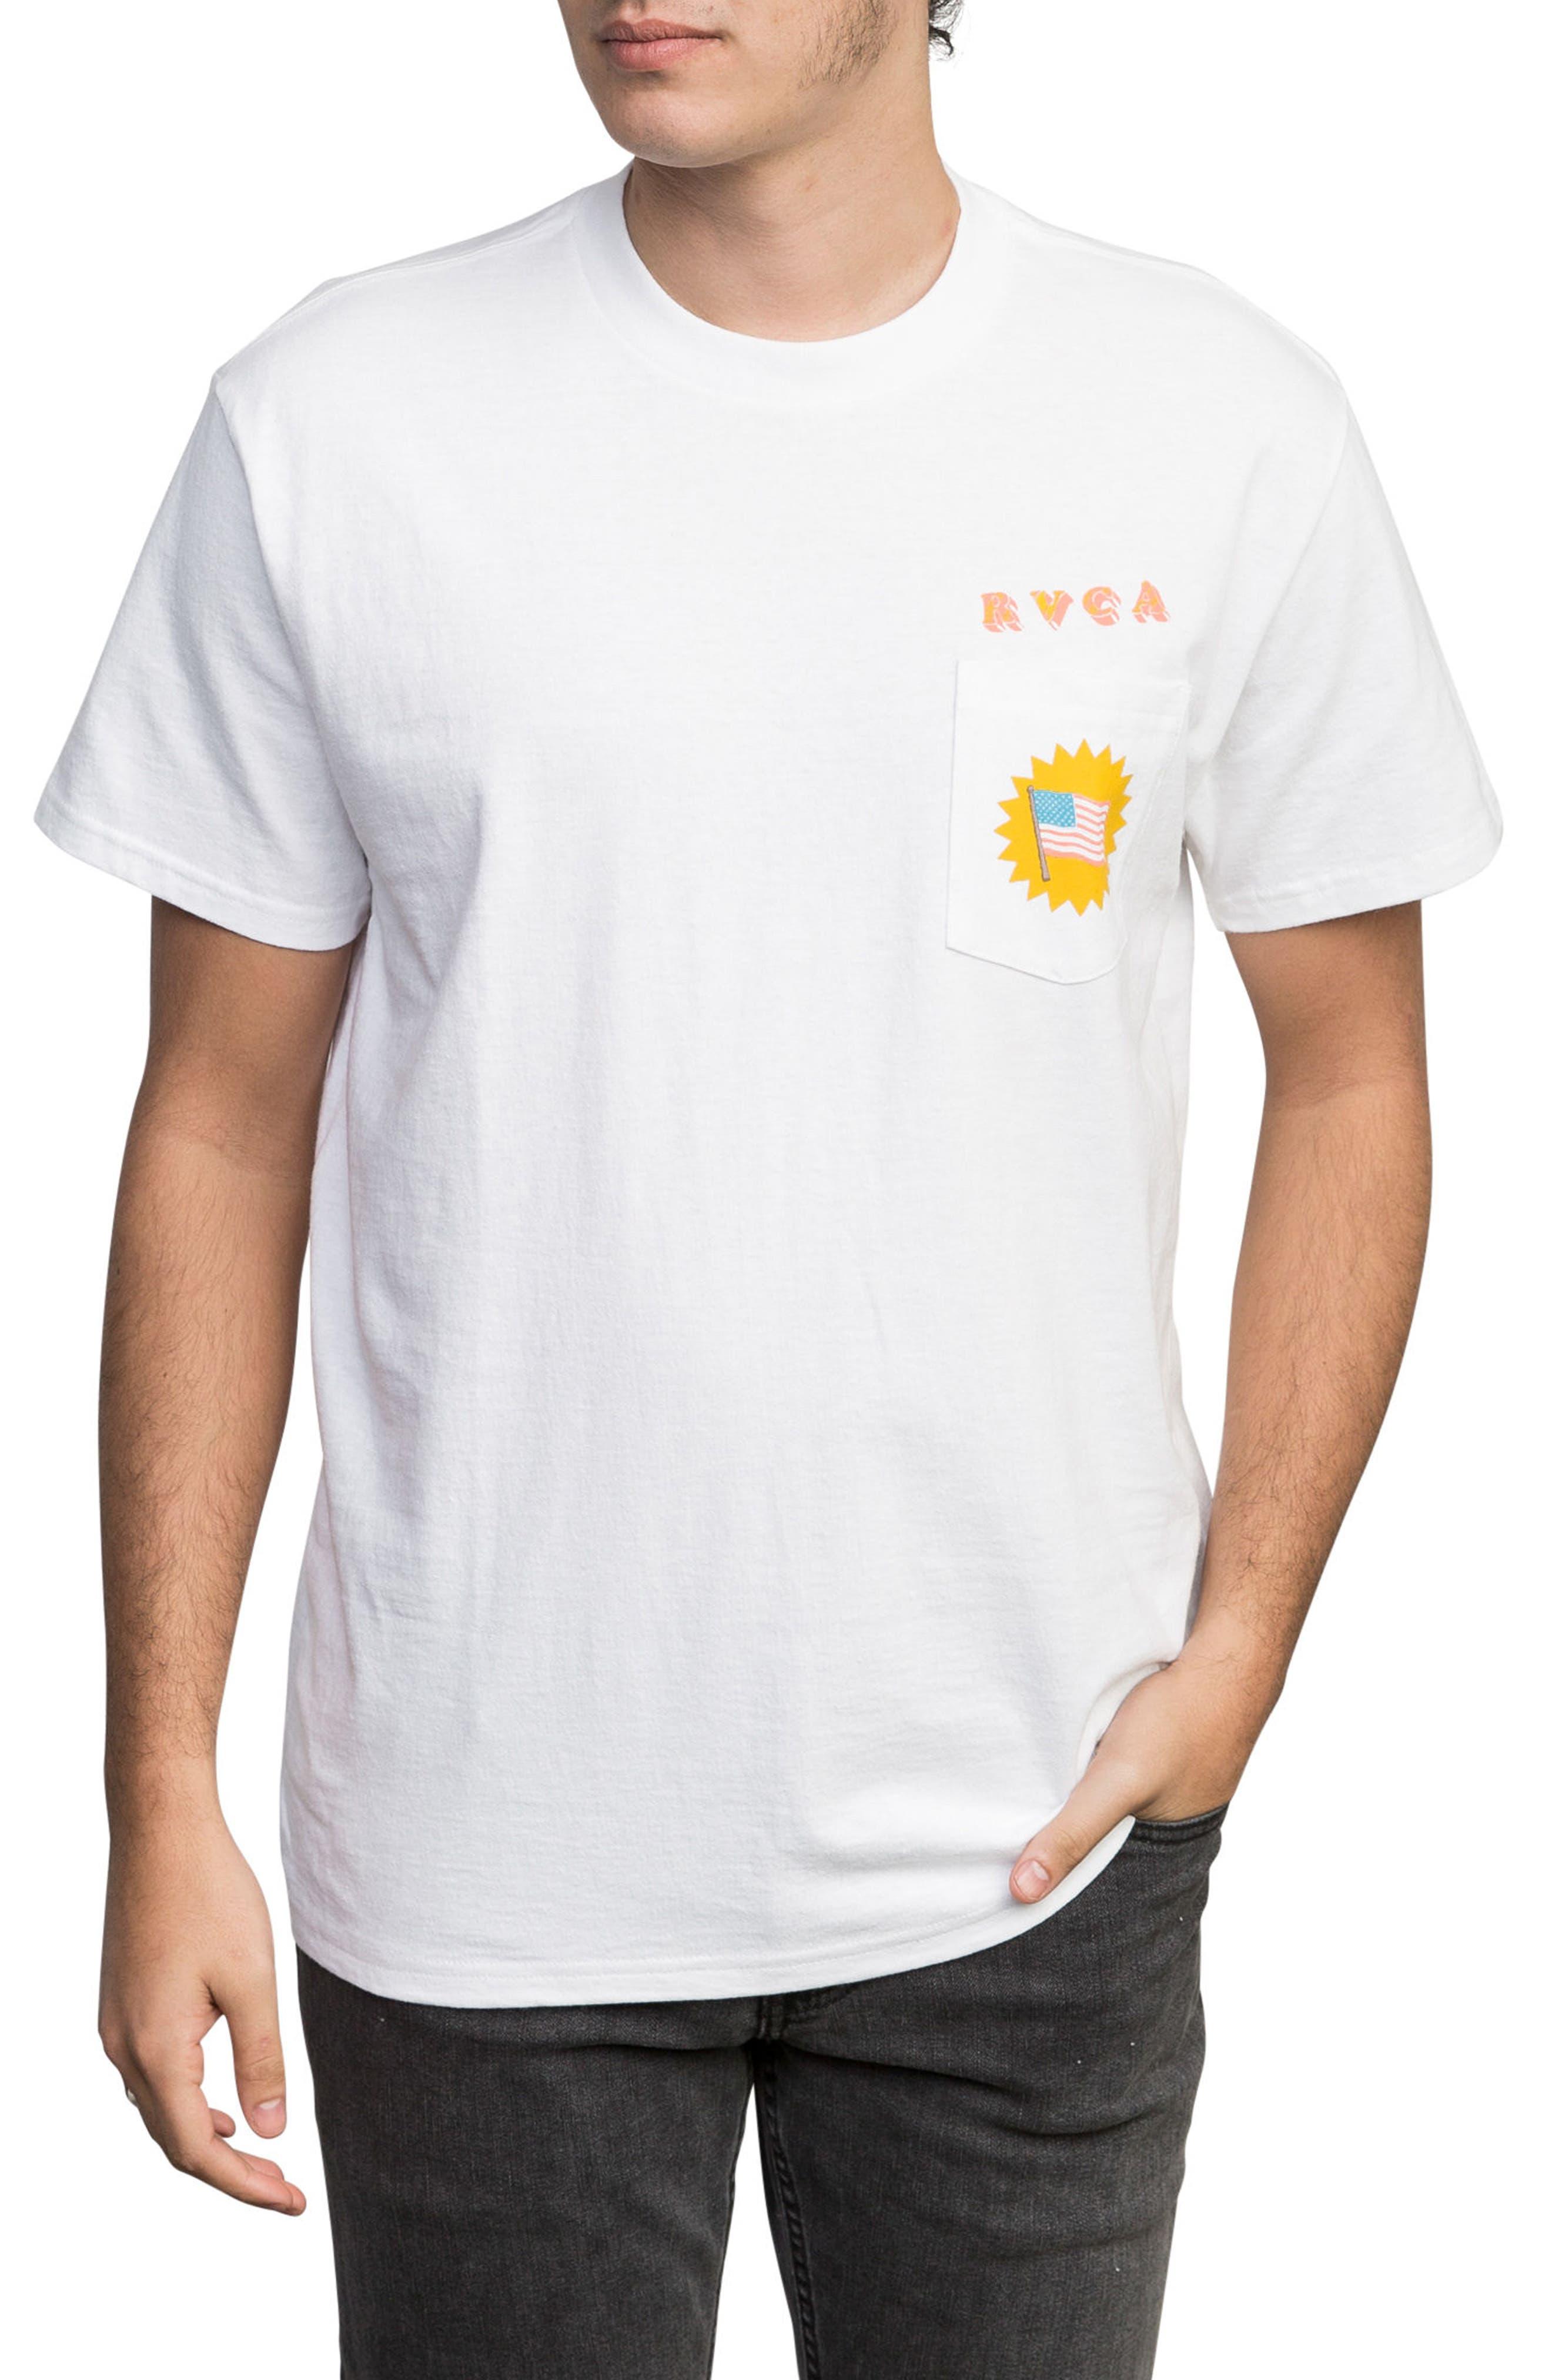 Luke Pelletier Blue Panther T-Shirt,                         Main,                         color, White